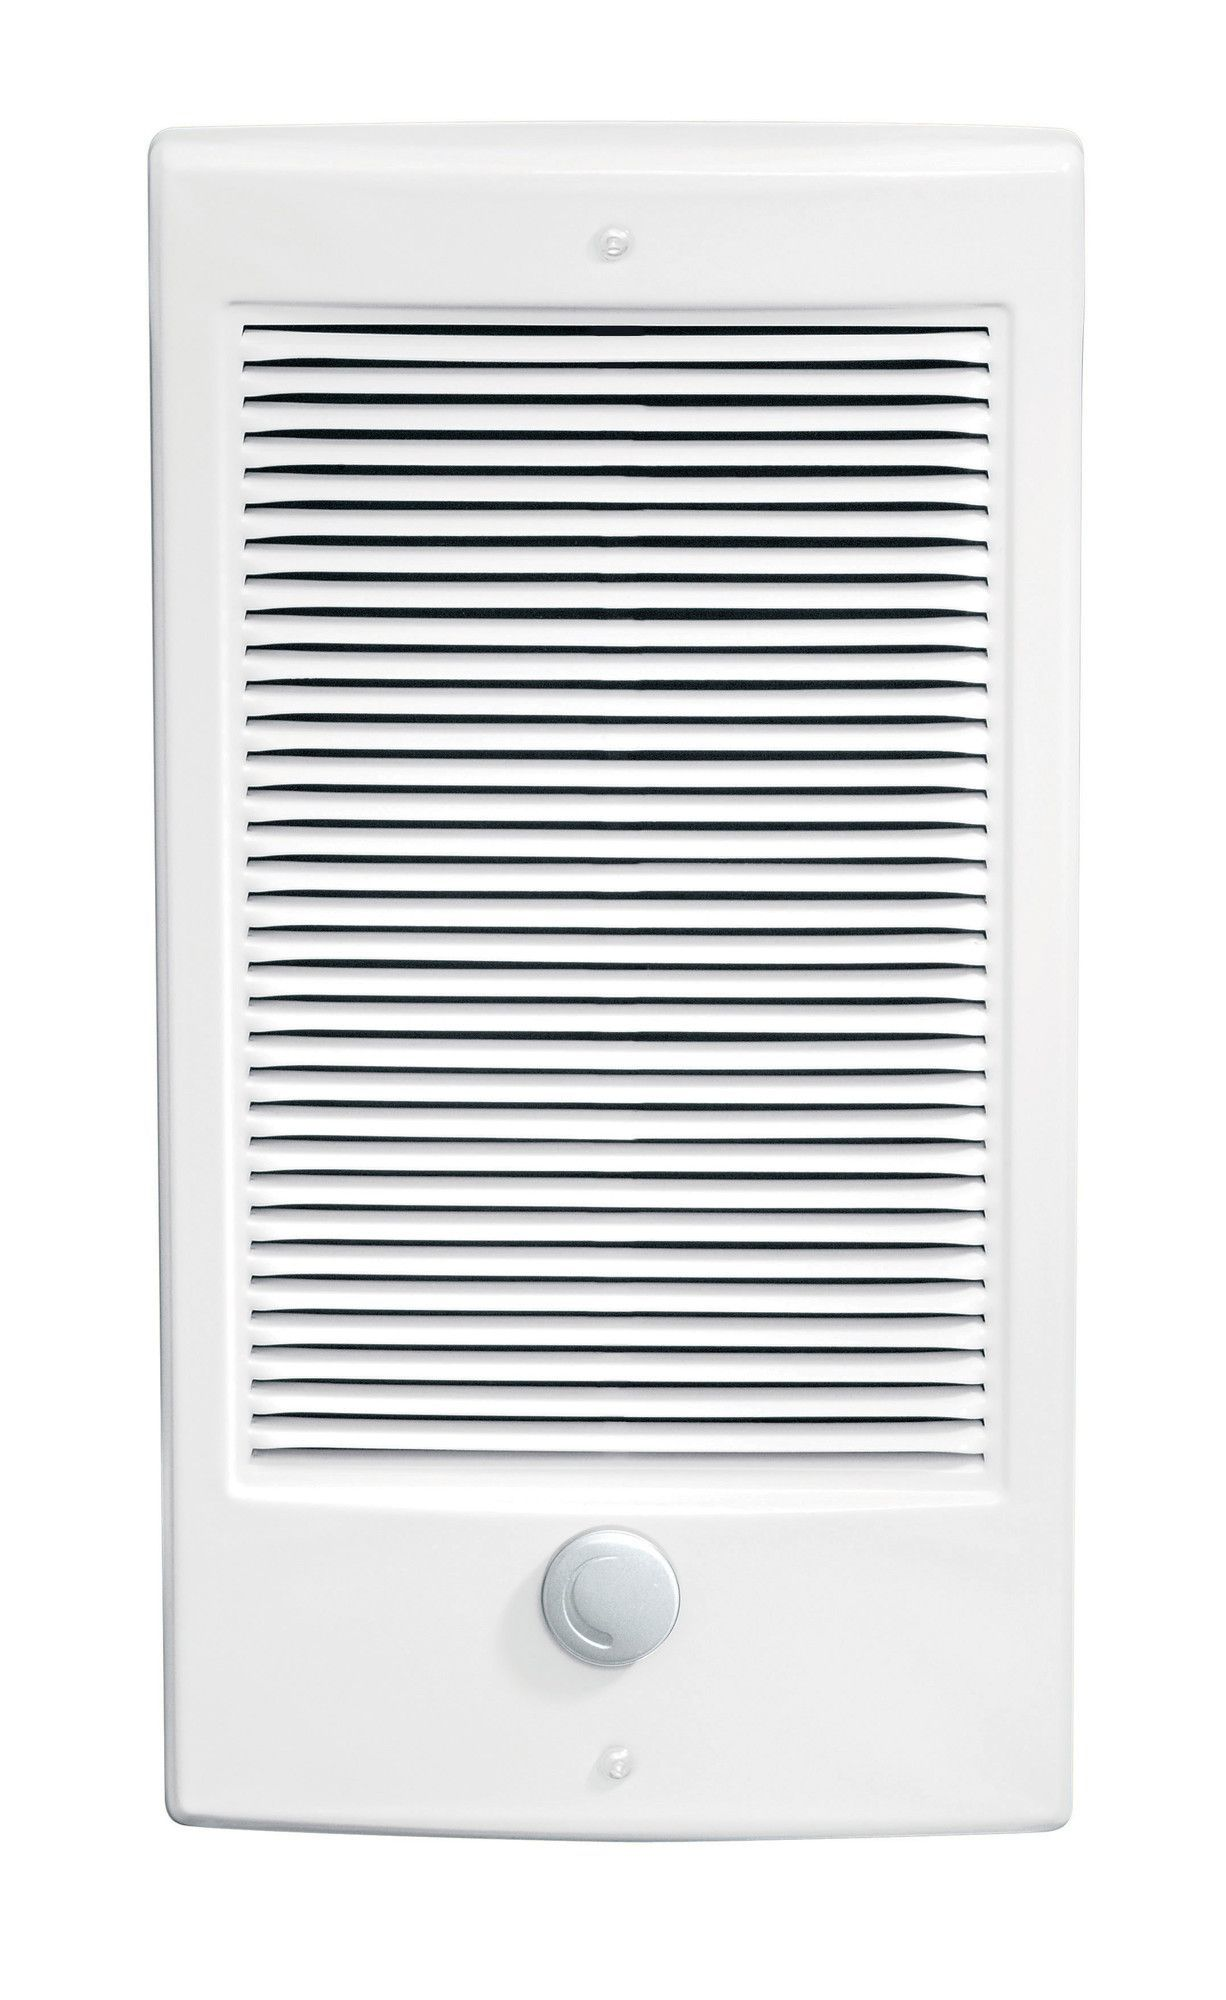 5 118 Btu Wall Insert Electric Fan Heater Wall Mounted Heater Dimplex Space Heaters